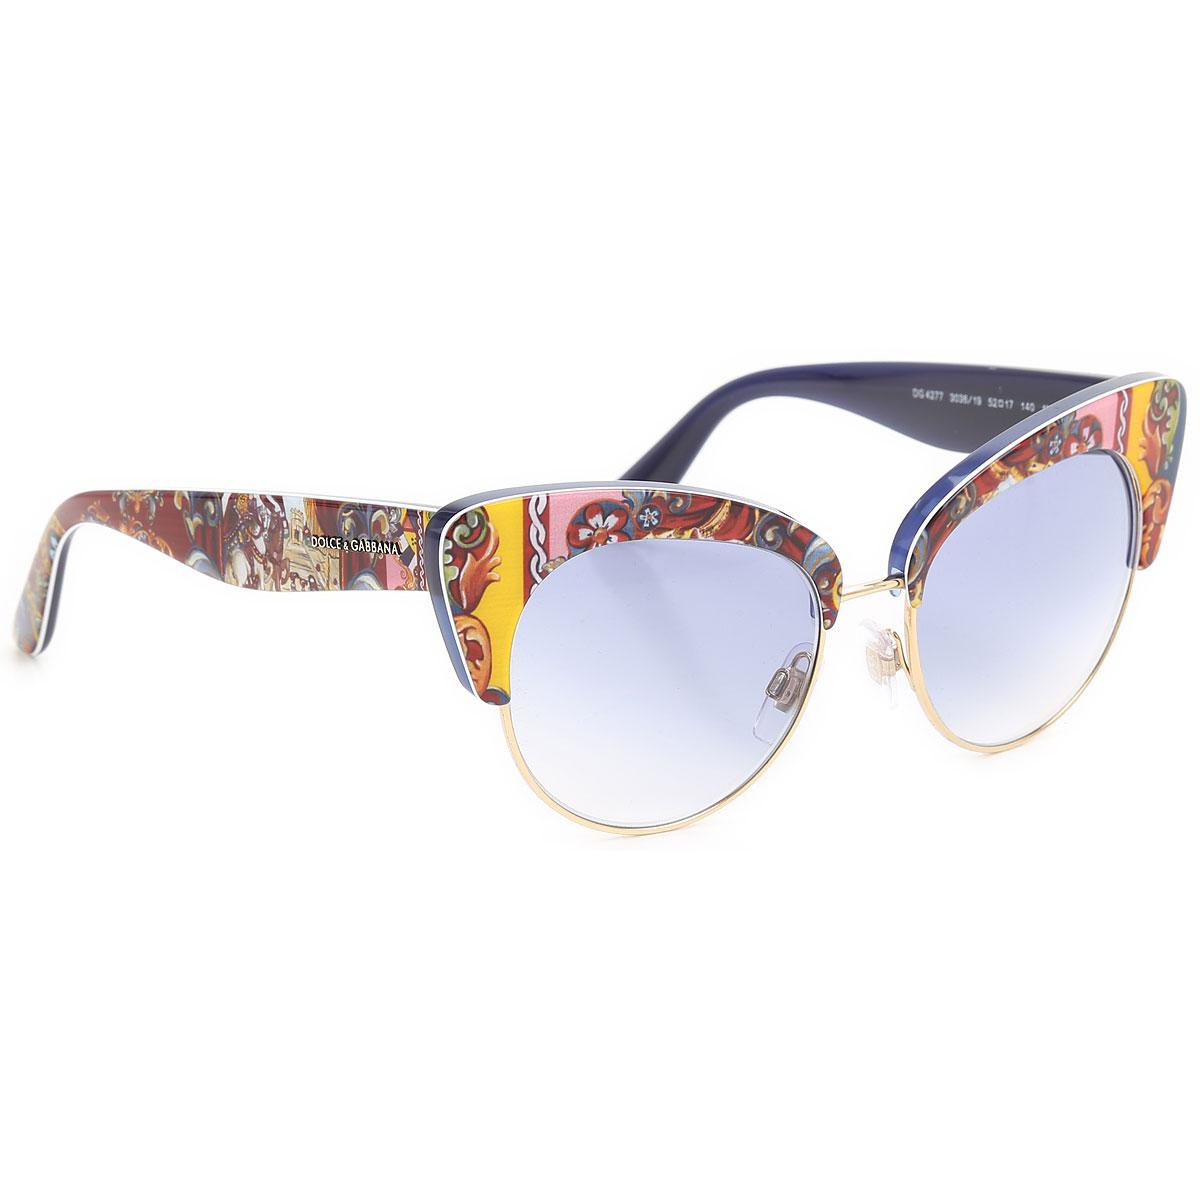 240ea75664c Dolce   Gabbana. Sunglasses